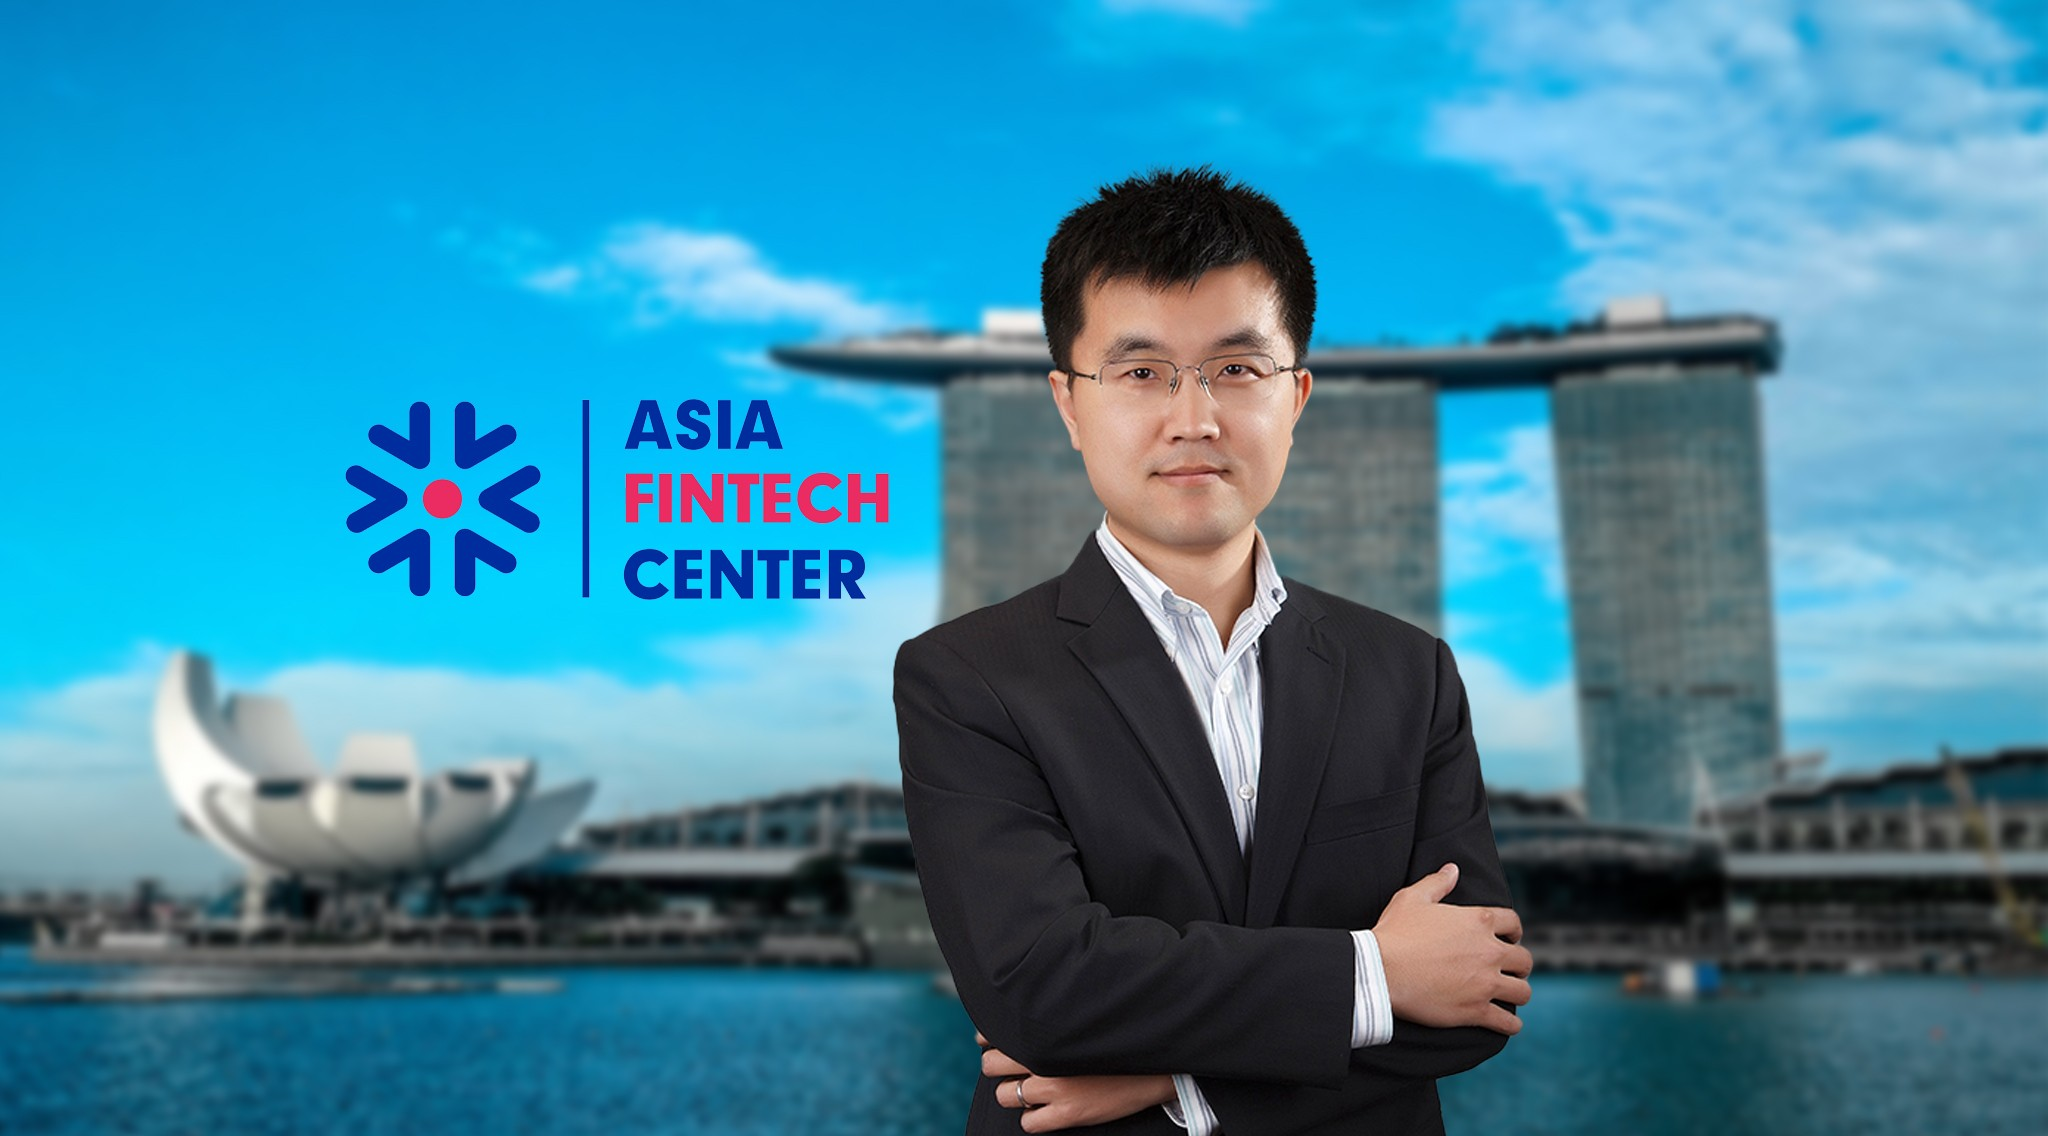 ZA Tech Opens New Asia Fintech Center In Singapore ...